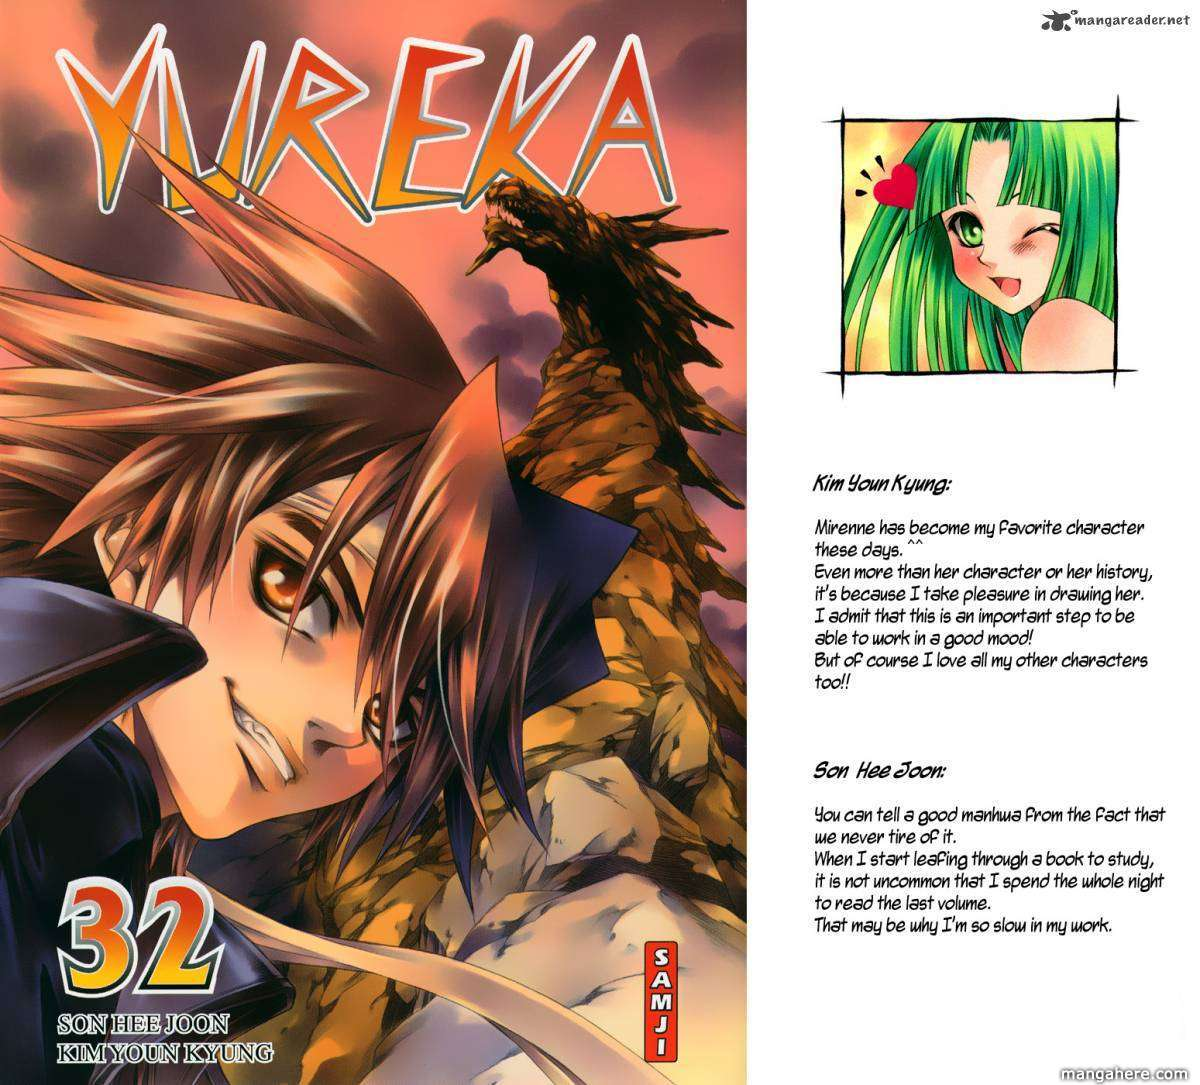 Yureka 197 Page 2